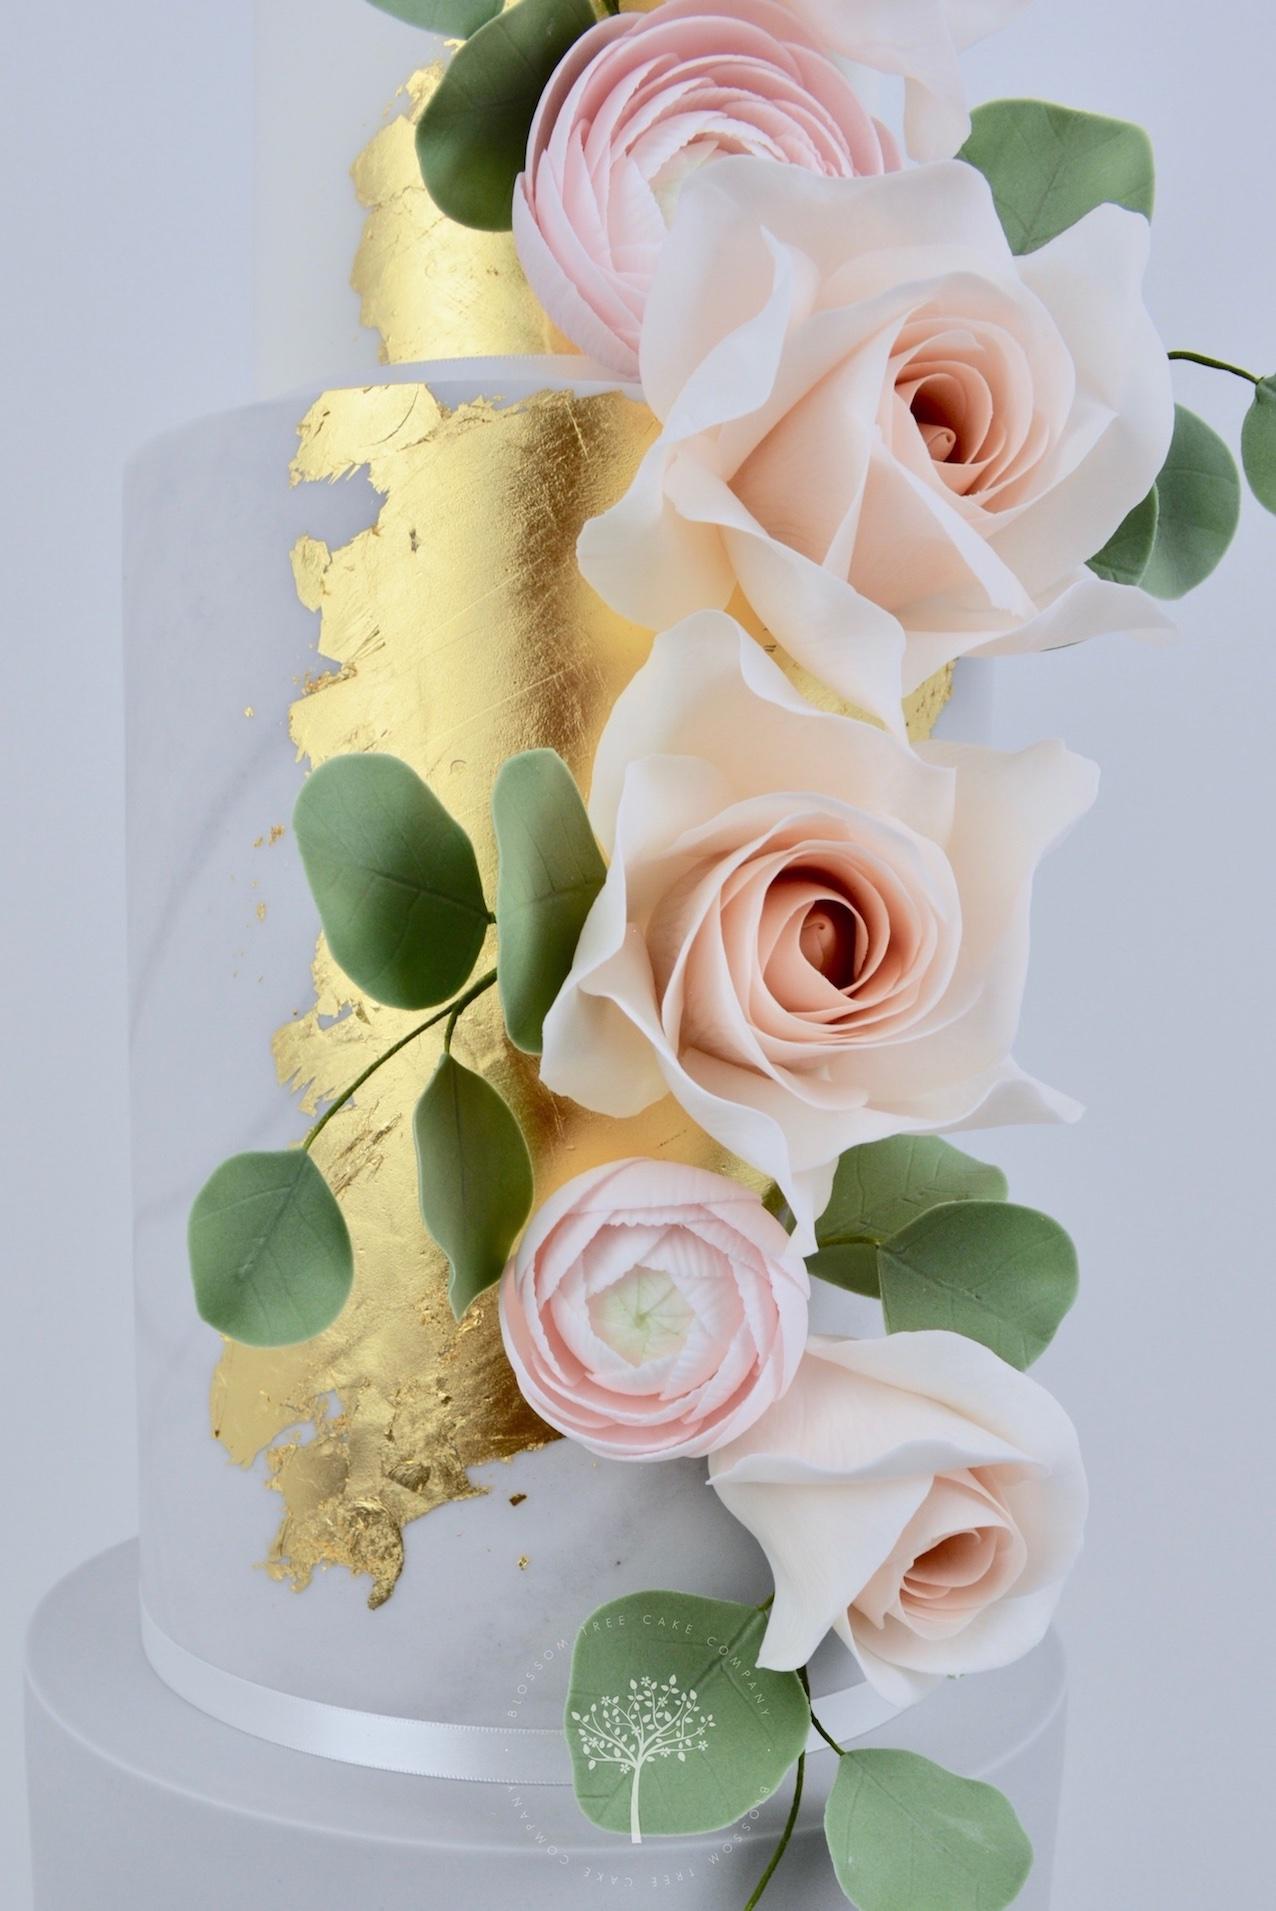 Rose Gold and Ranunculus wedding cake by Blossom Tree Cake Company Harrogate North Yorkshire - sugar flowers.jpg